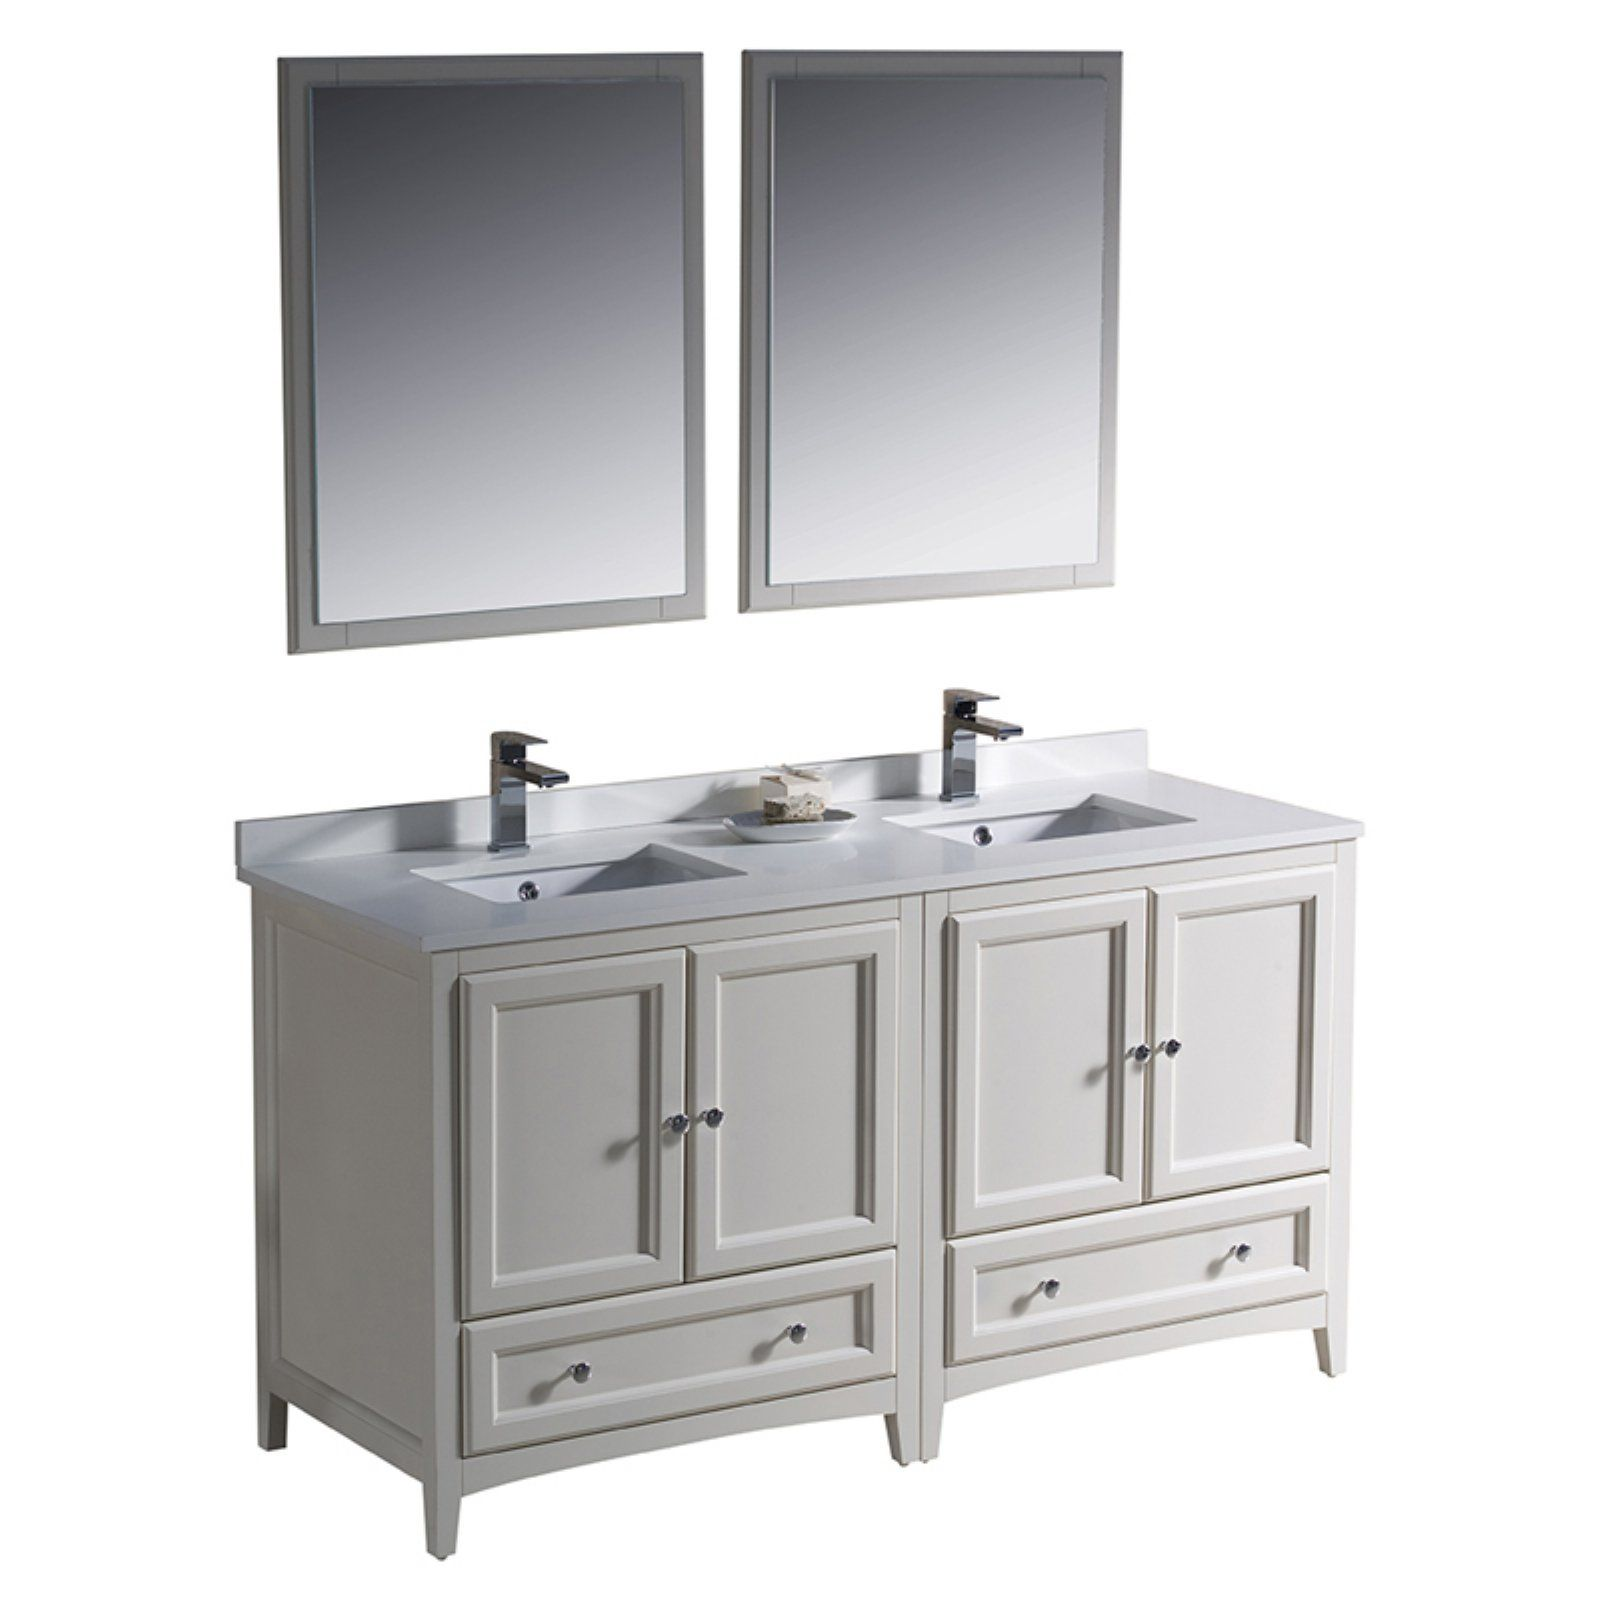 Fresca Fvn20 3030 Oxford 60 In Double Bathroom Vanity